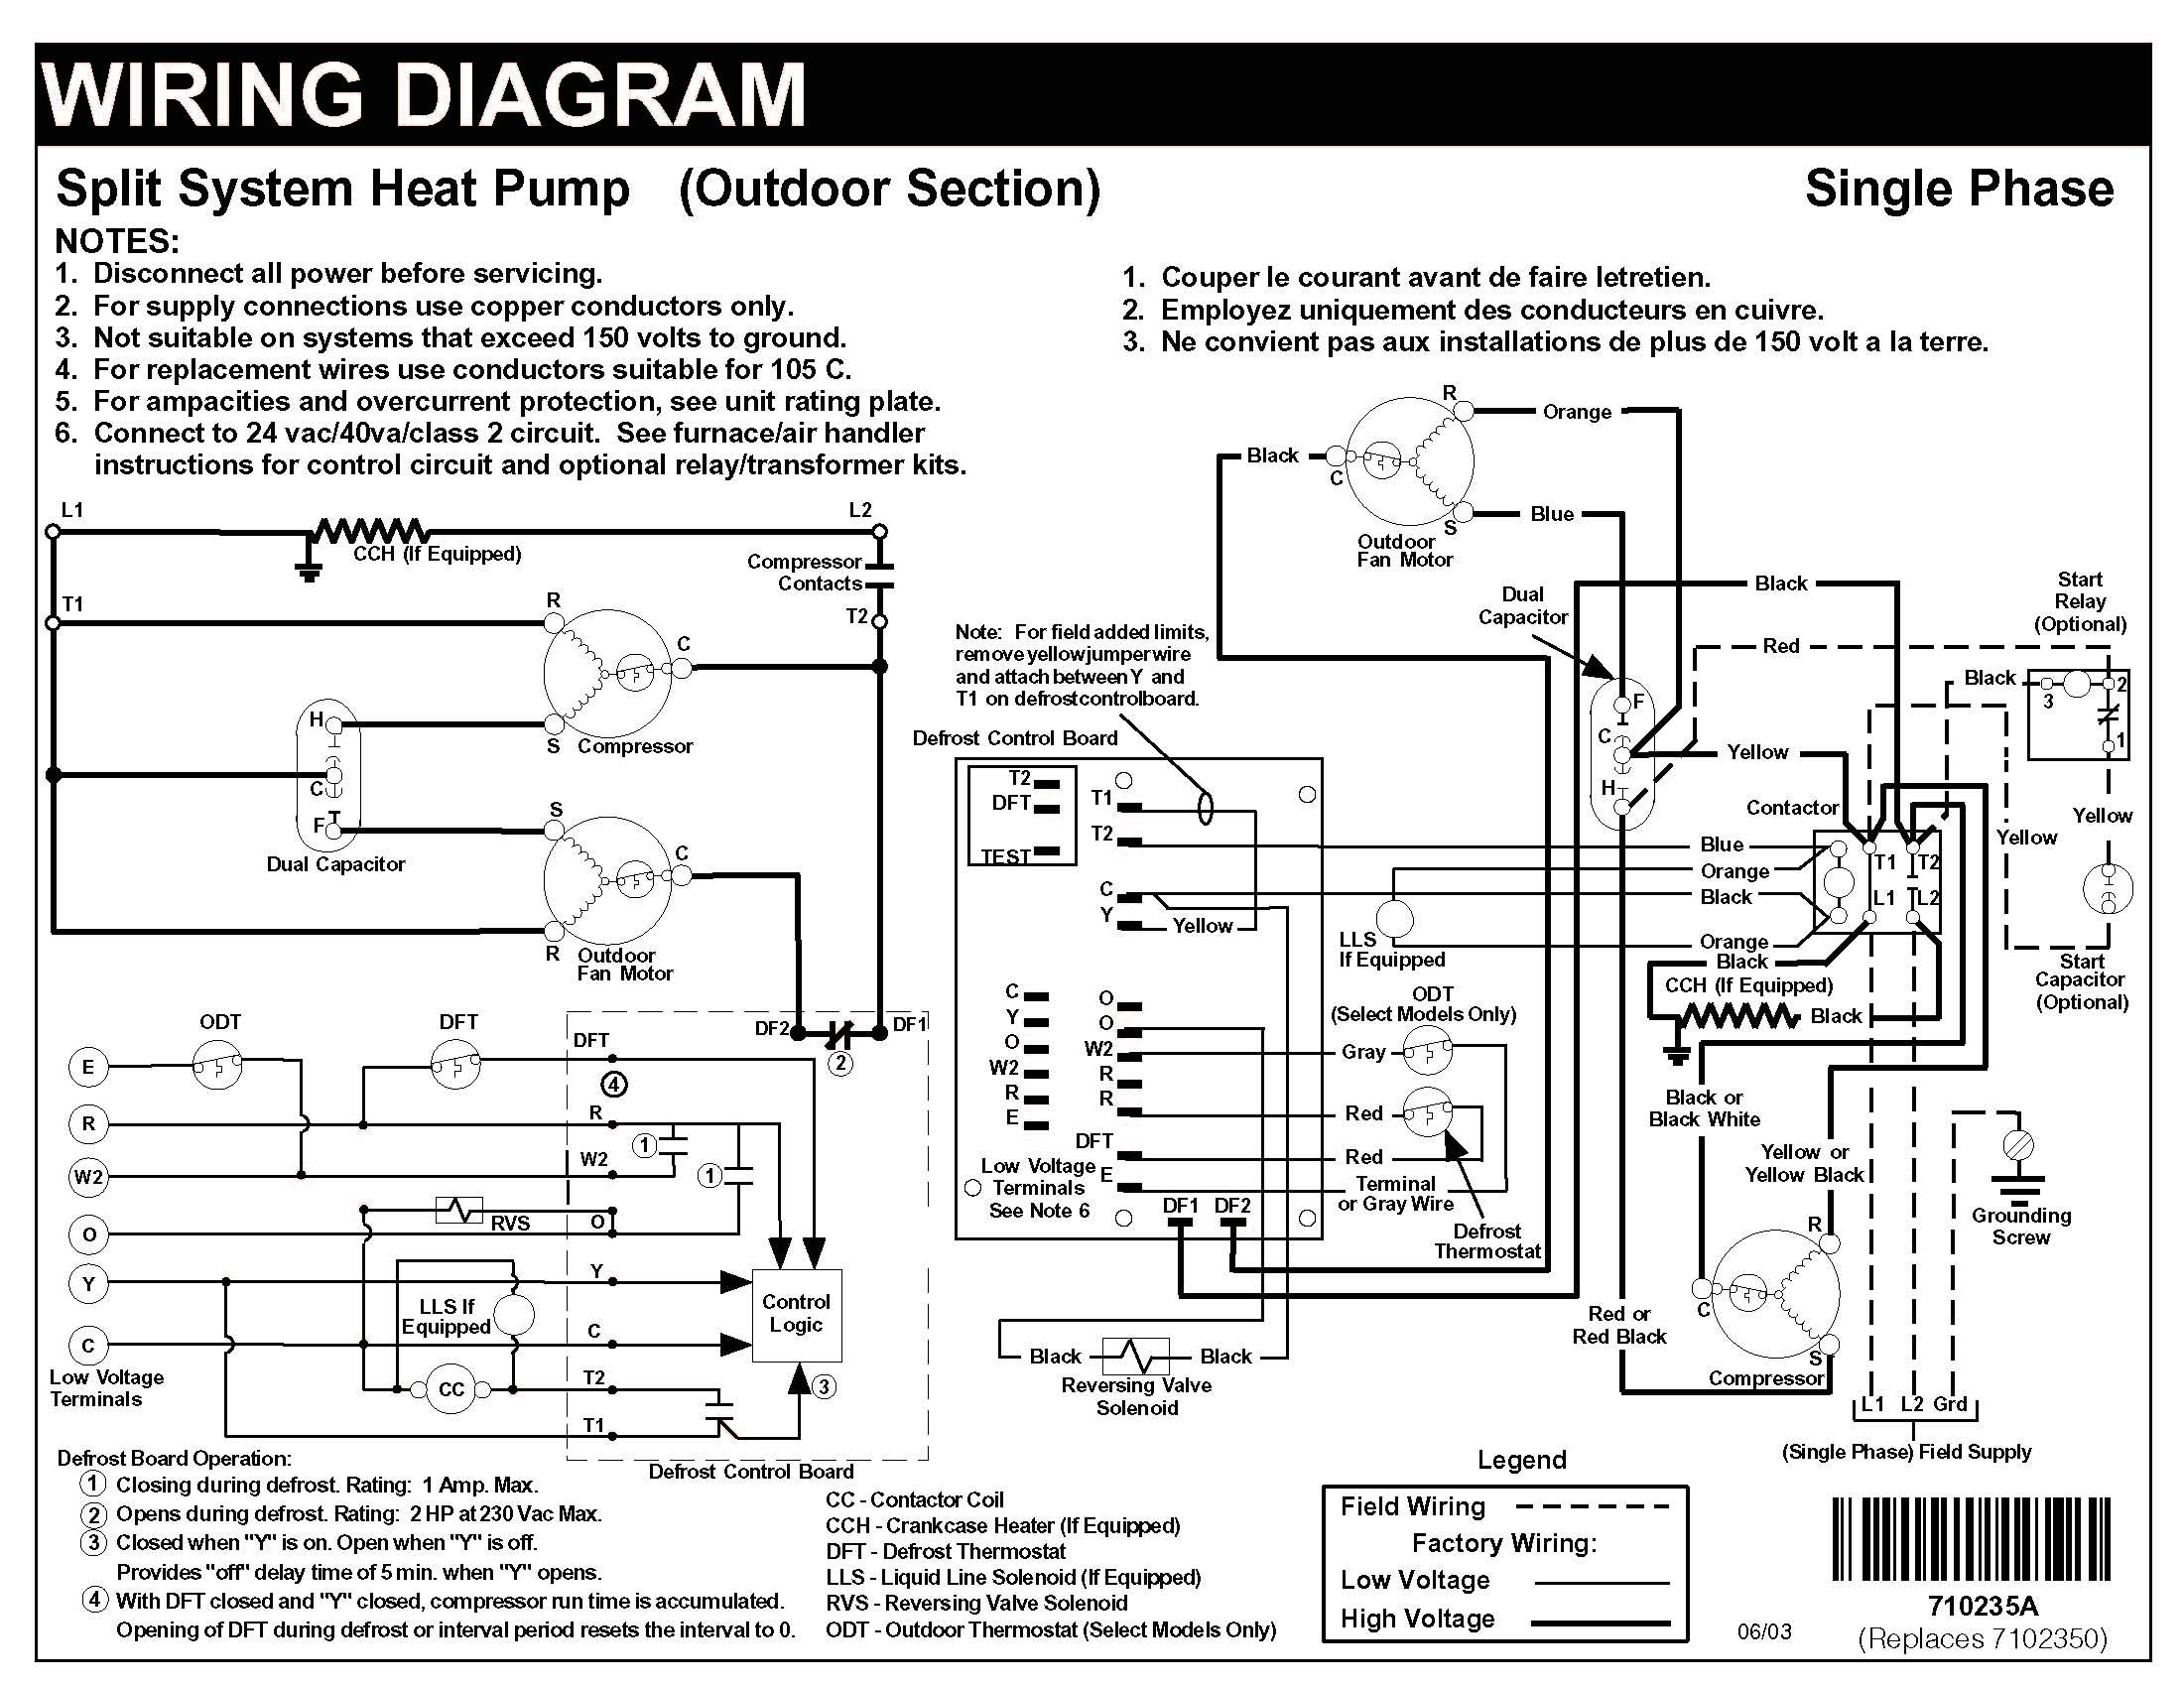 lennox heat pump diagram wiring diagrams scematic lennox cbx diagram heat pumps residential heat pumps heat [ 2201 x 1701 Pixel ]